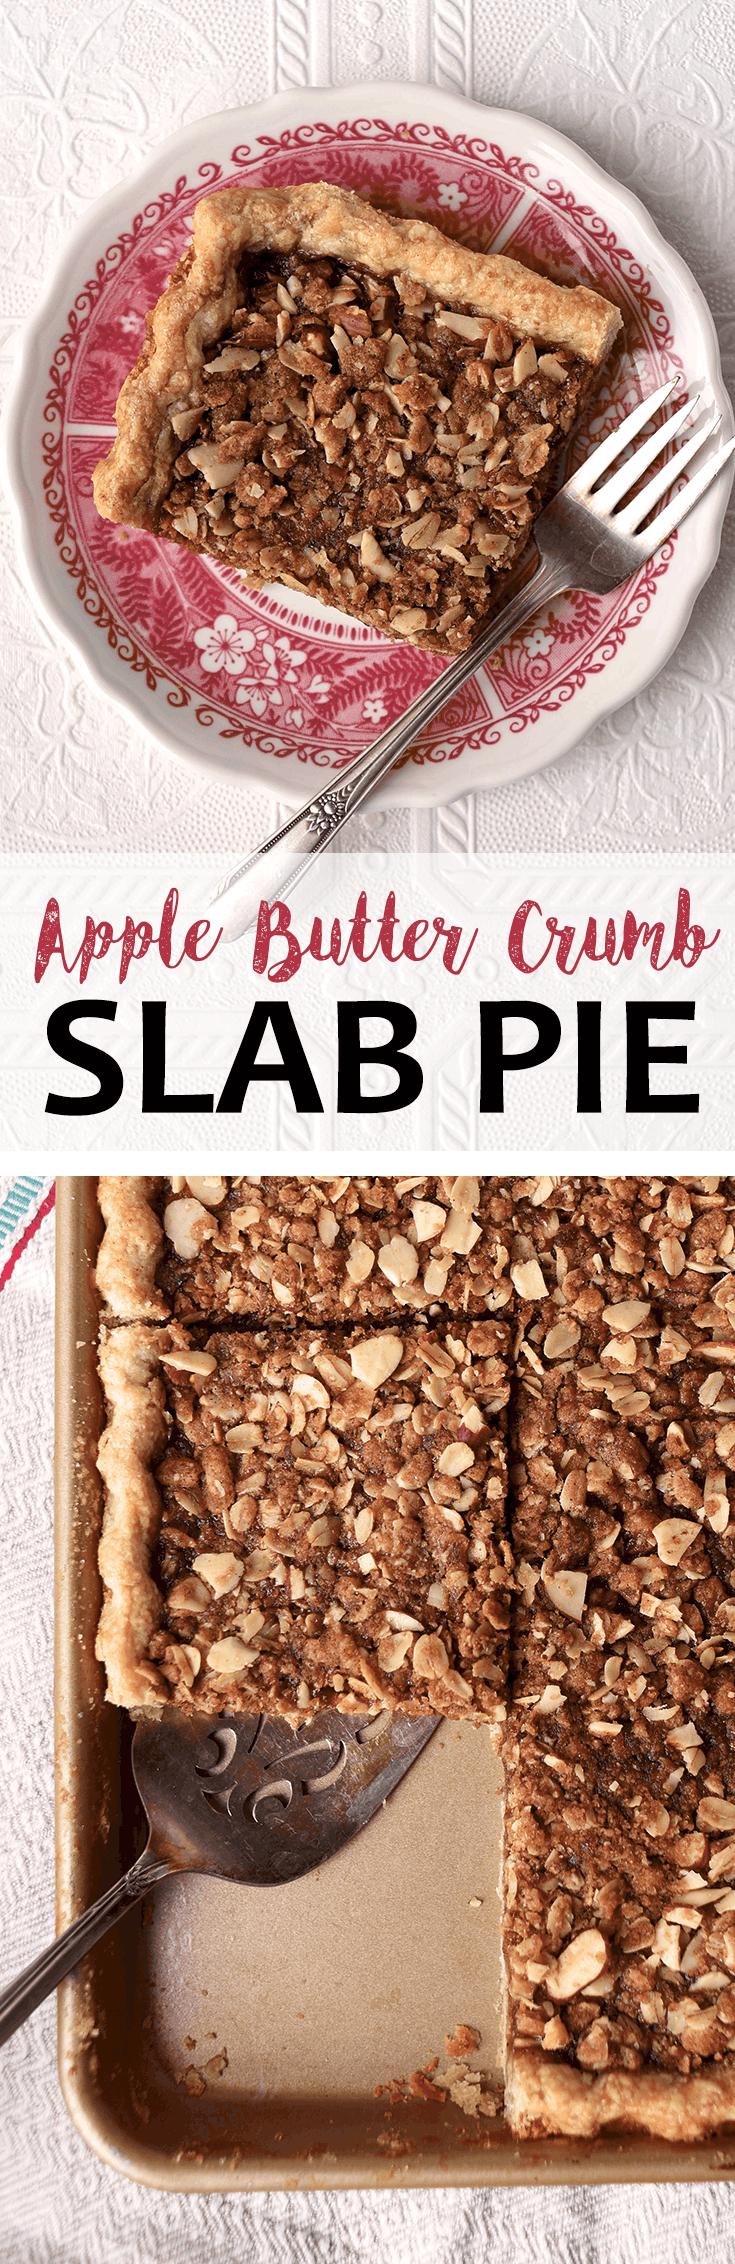 Apple Butter Crumb Slab Pie Pin - Apple Butter Crumb Slab Pie